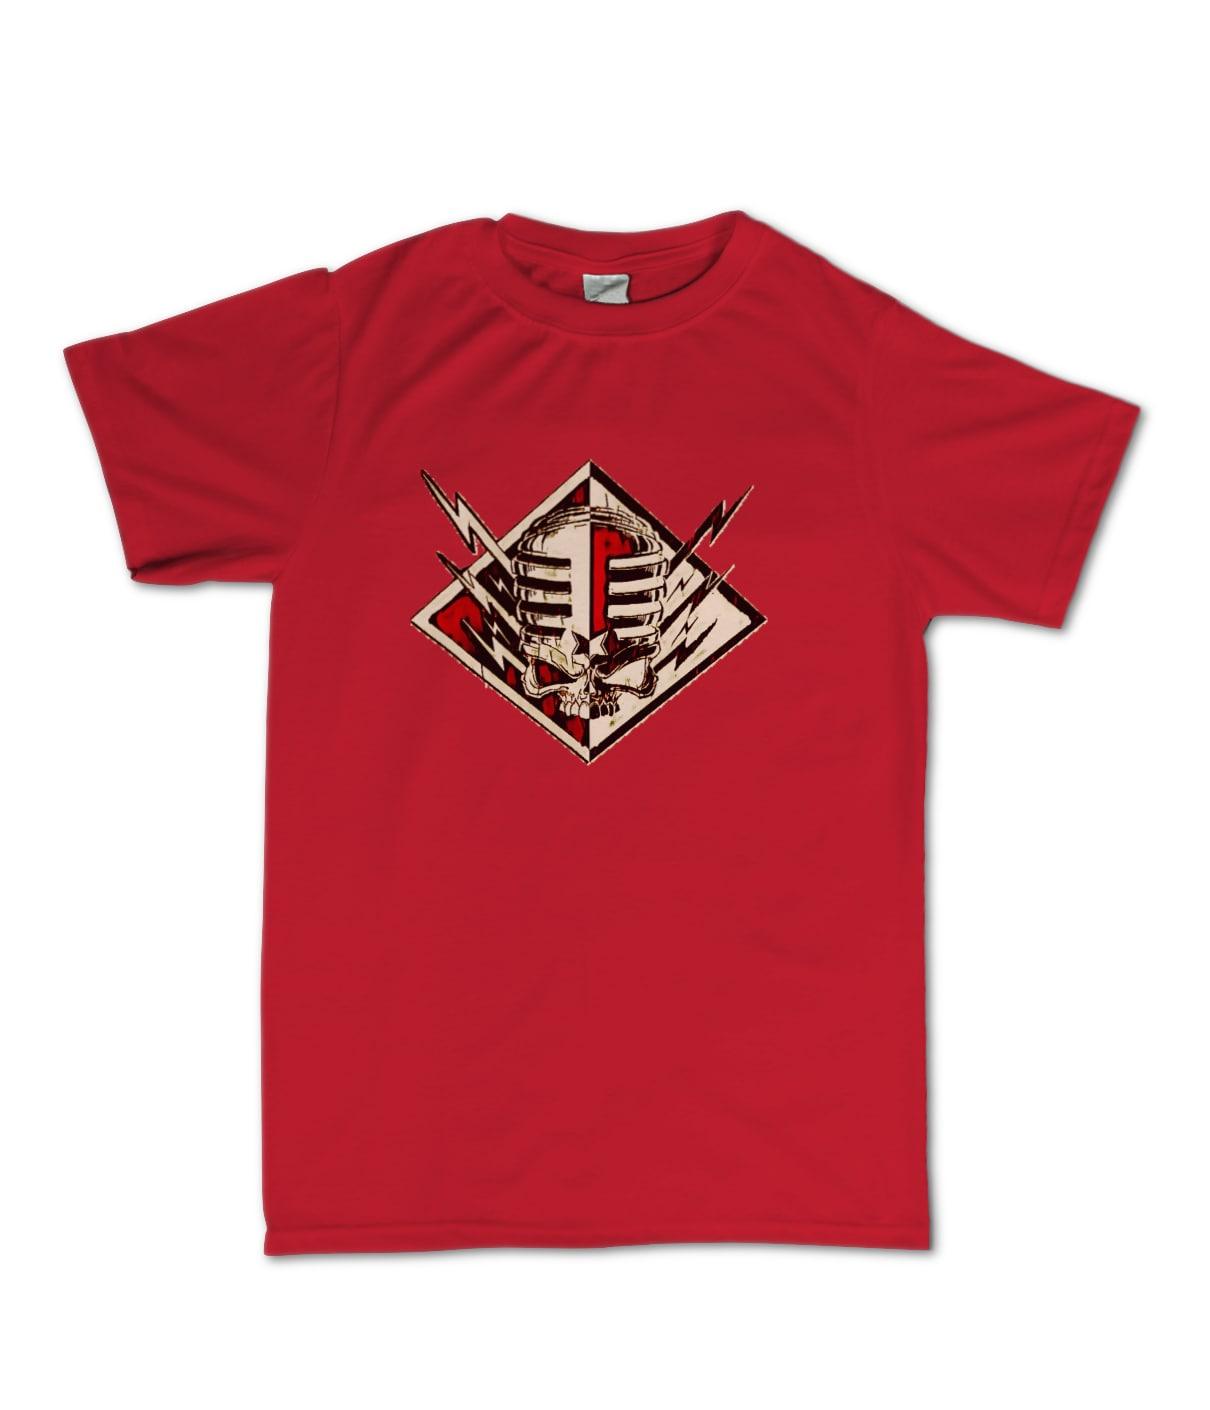 Tbs shirt classic skull tee 1534338389